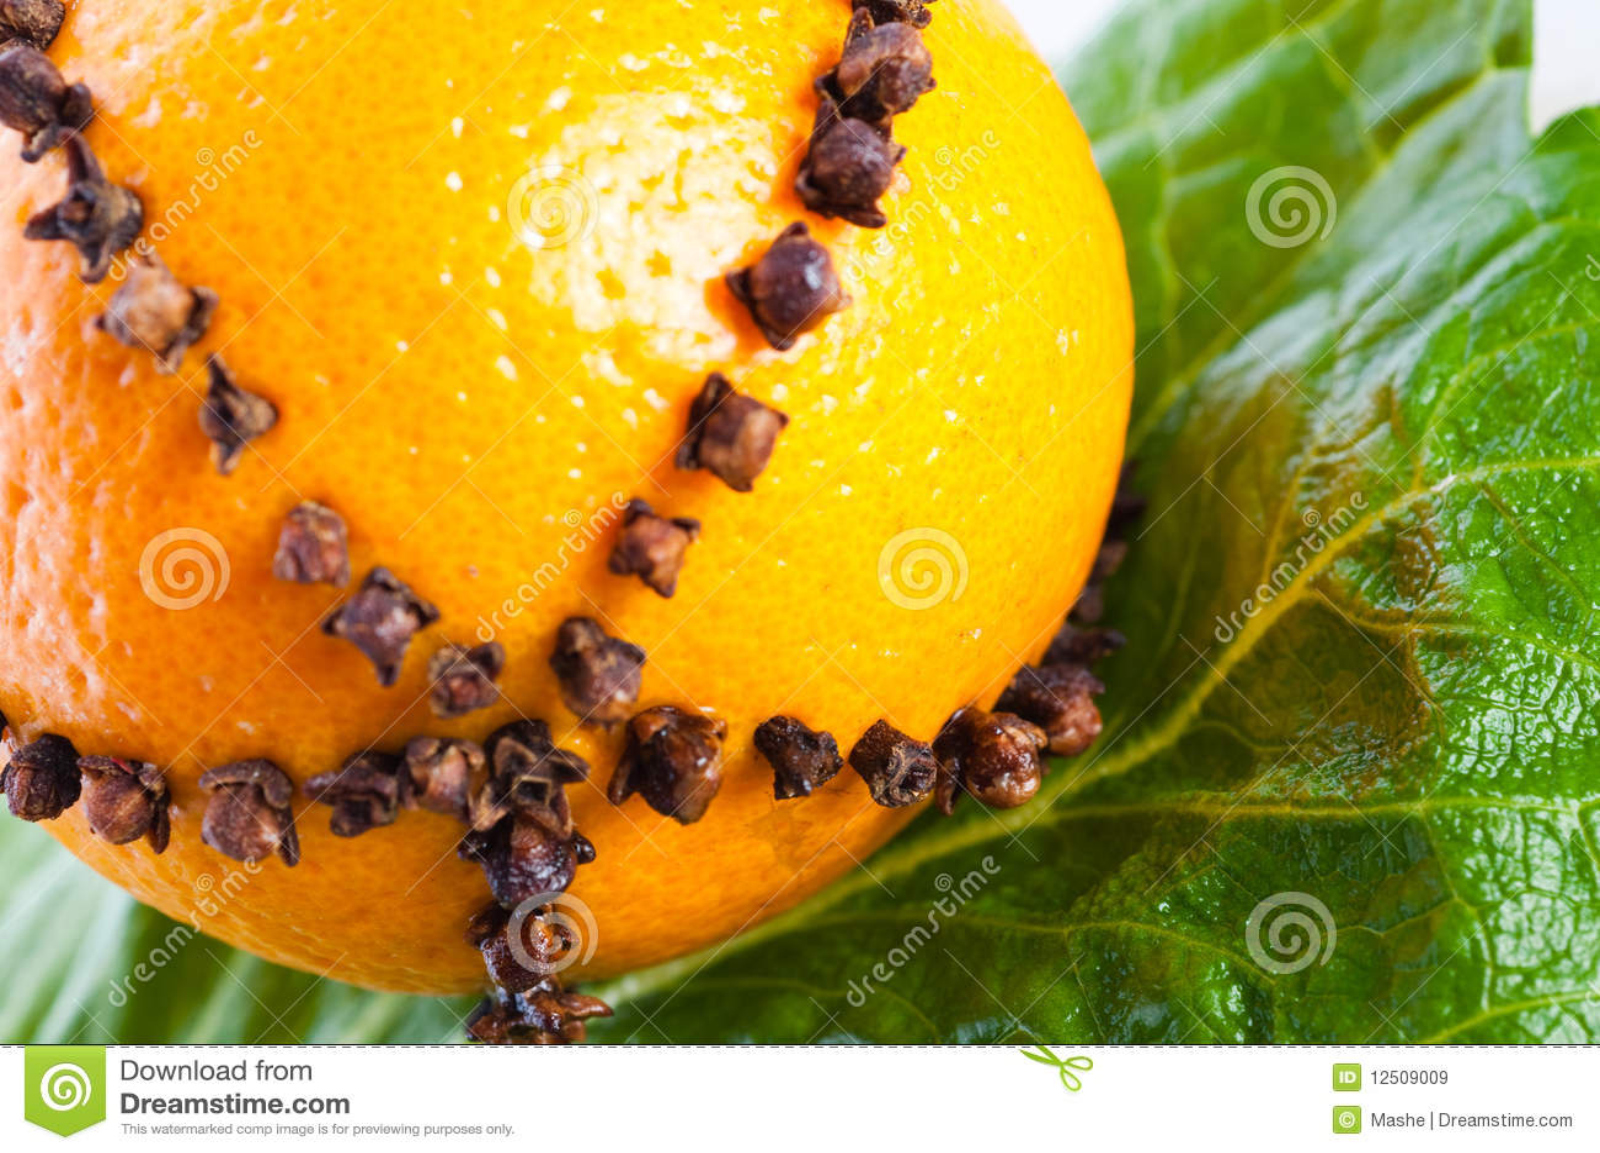 orangen verziert mit nelken stockbild bild 12509009. Black Bedroom Furniture Sets. Home Design Ideas